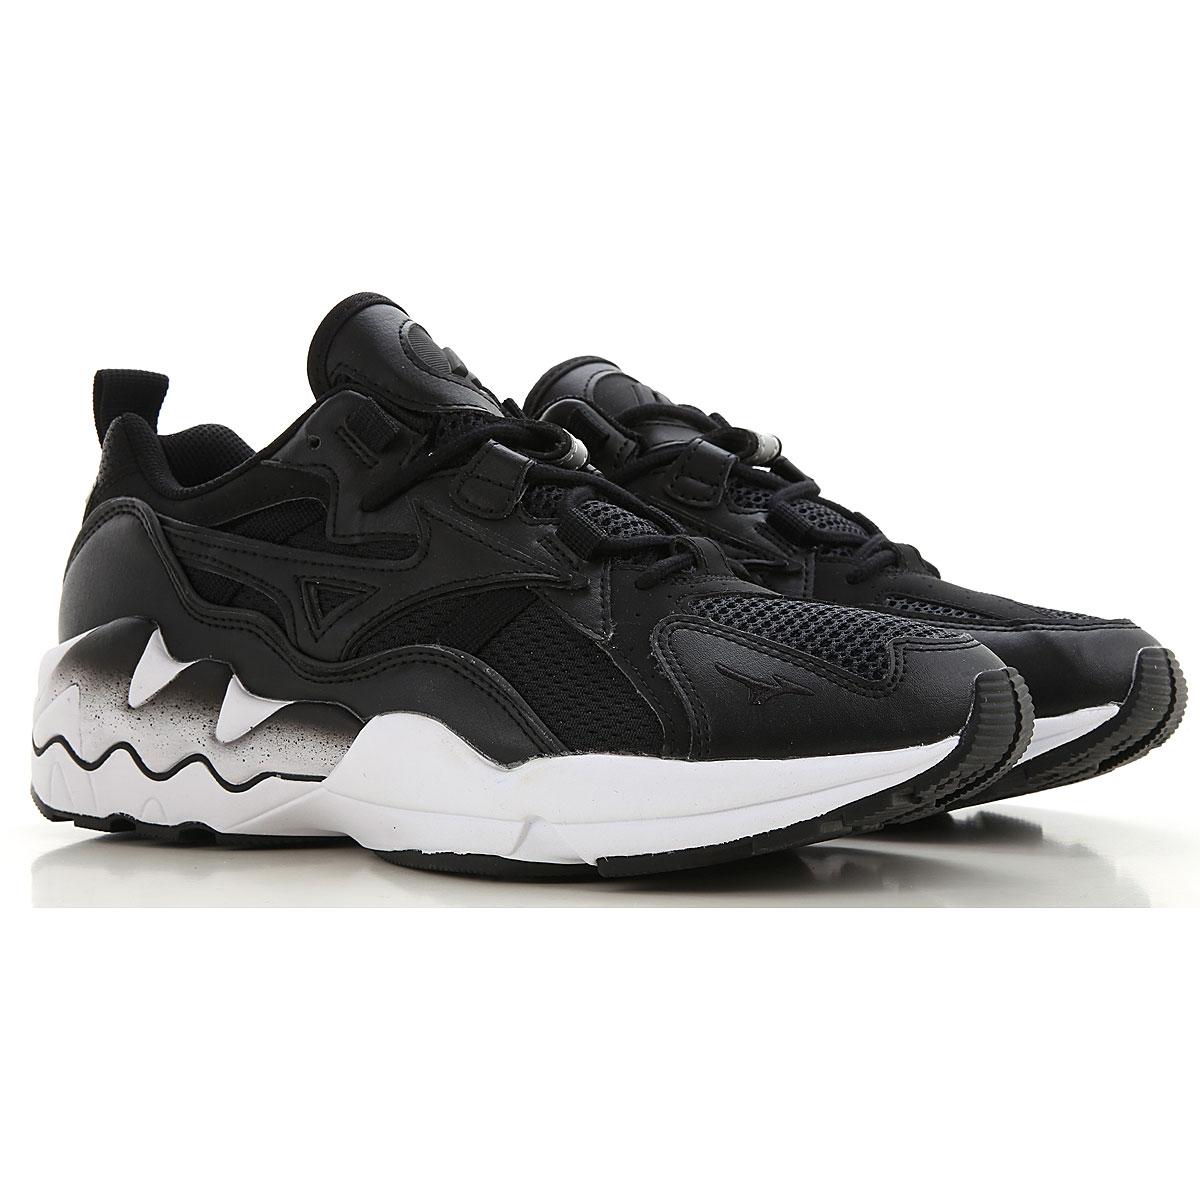 Mizuno Sneakers for Men, Black, Leather, 2019, 9